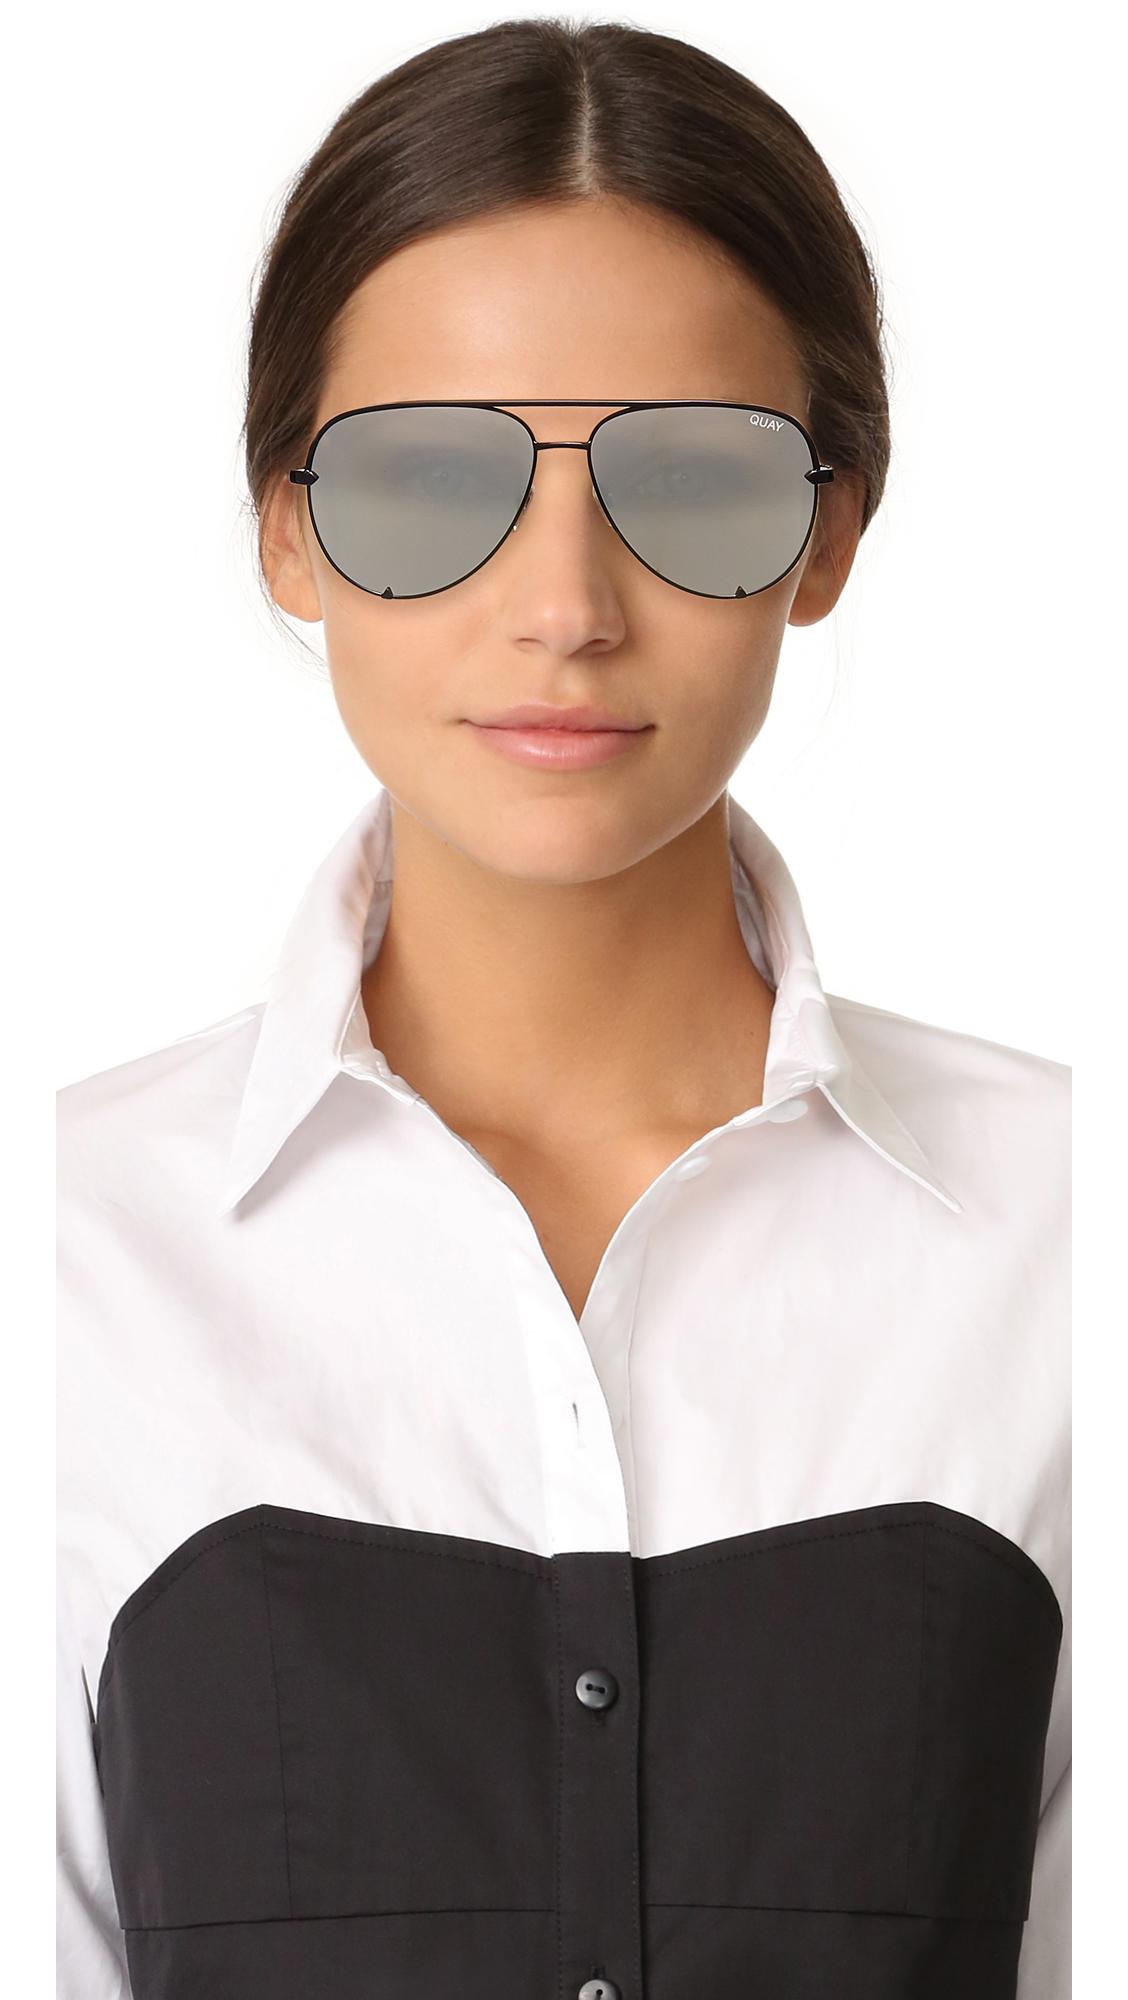 9507868891b Quay Quay x Desi Perkins High Key Sunglasses